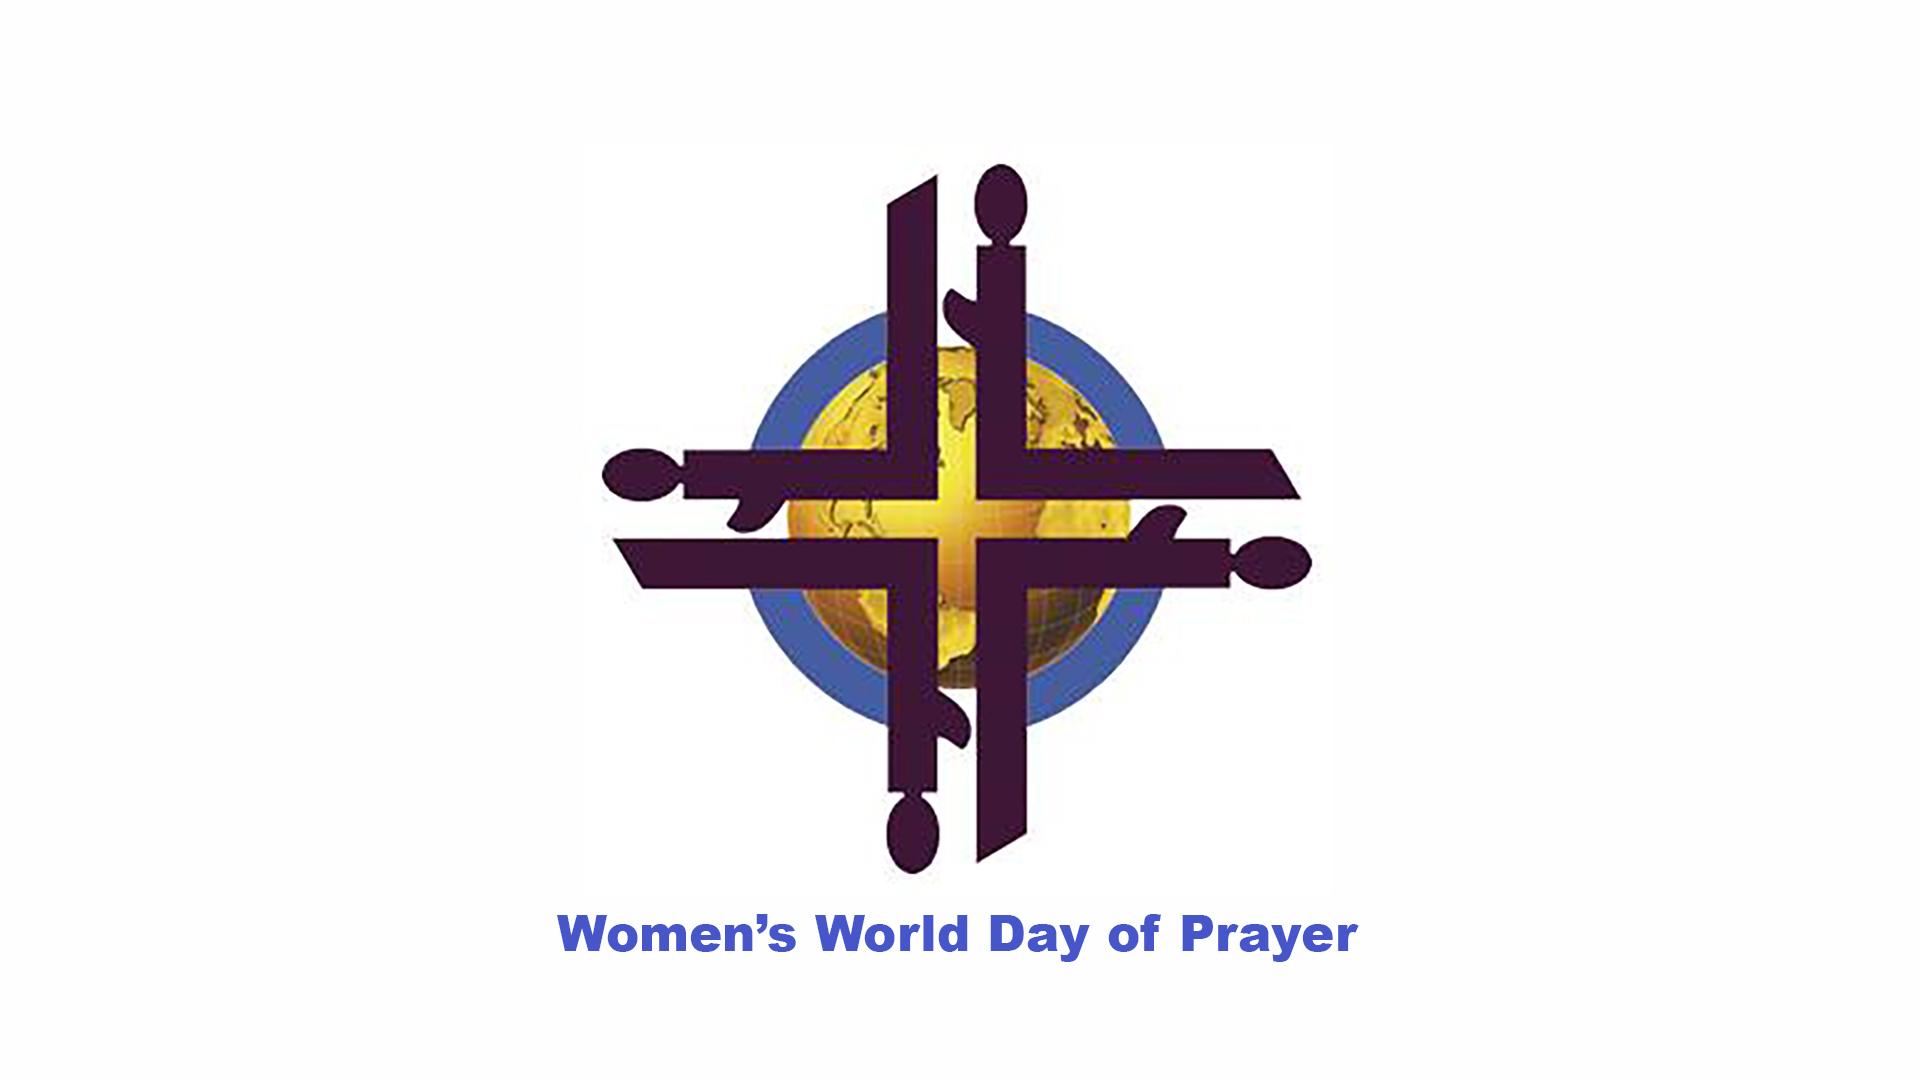 Women's World Day of Prayerfacebook.jpg